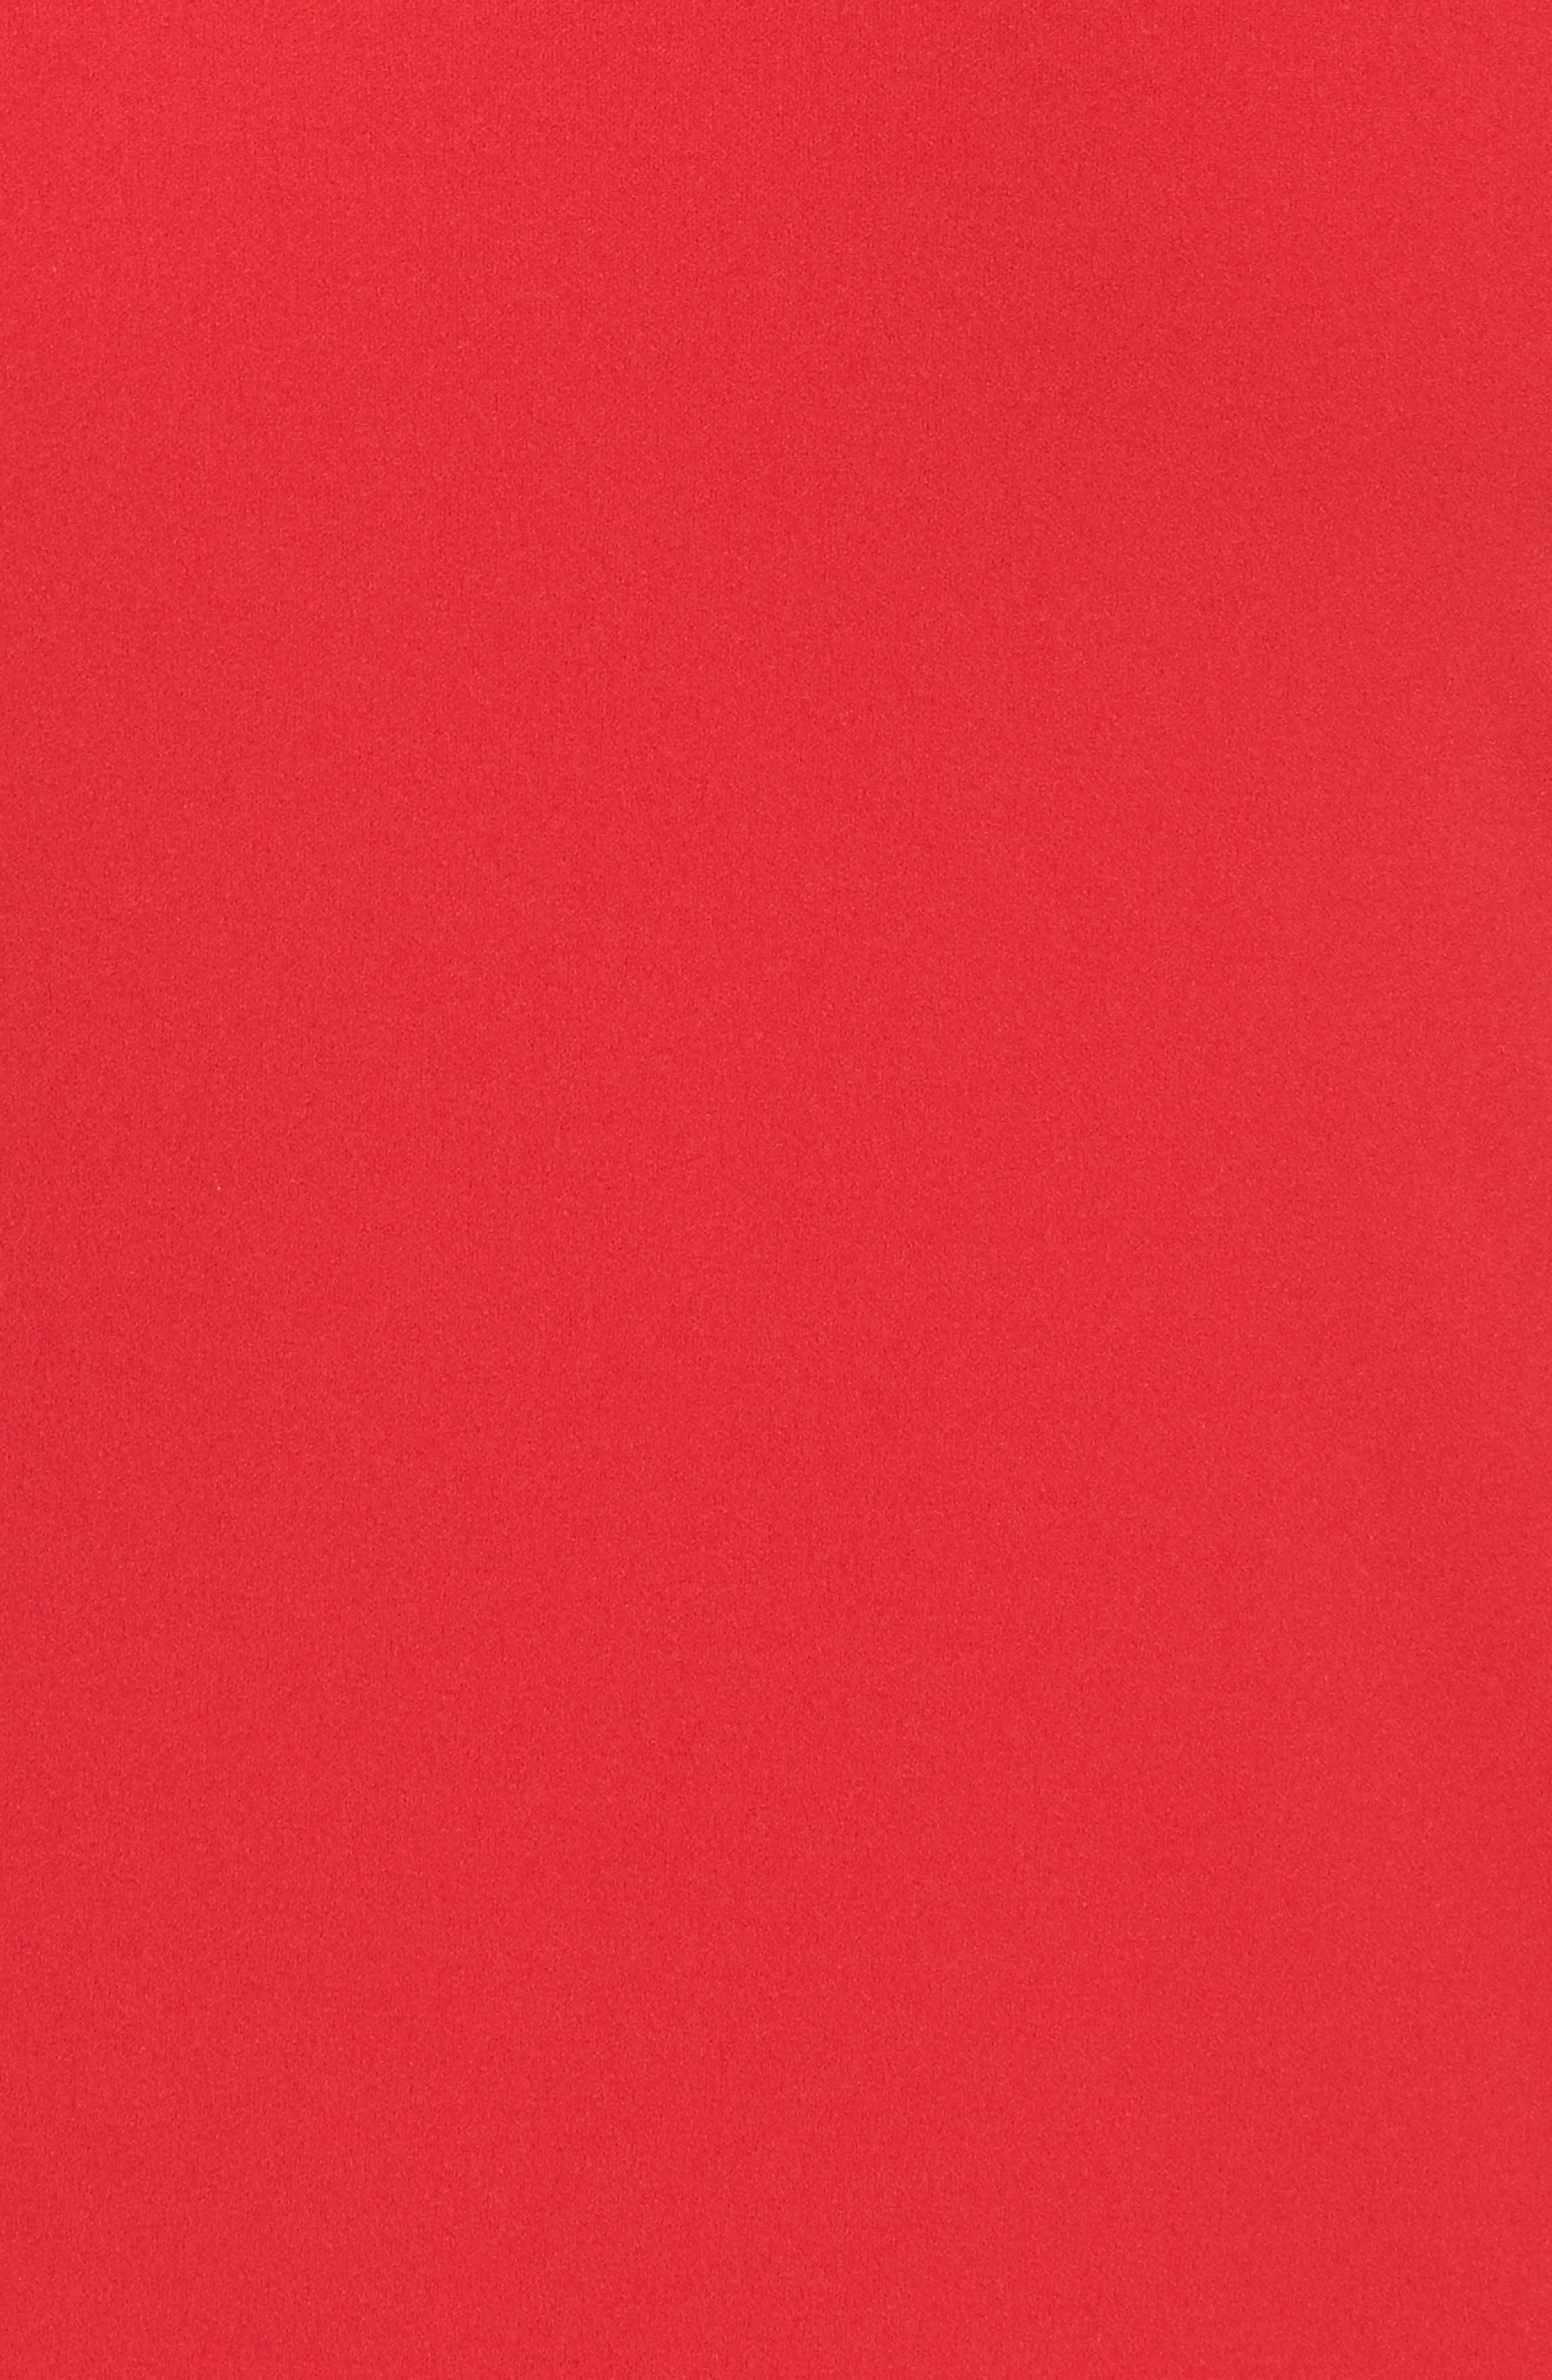 Bell Sleeve Shift Dress,                             Alternate thumbnail 6, color,                             Red